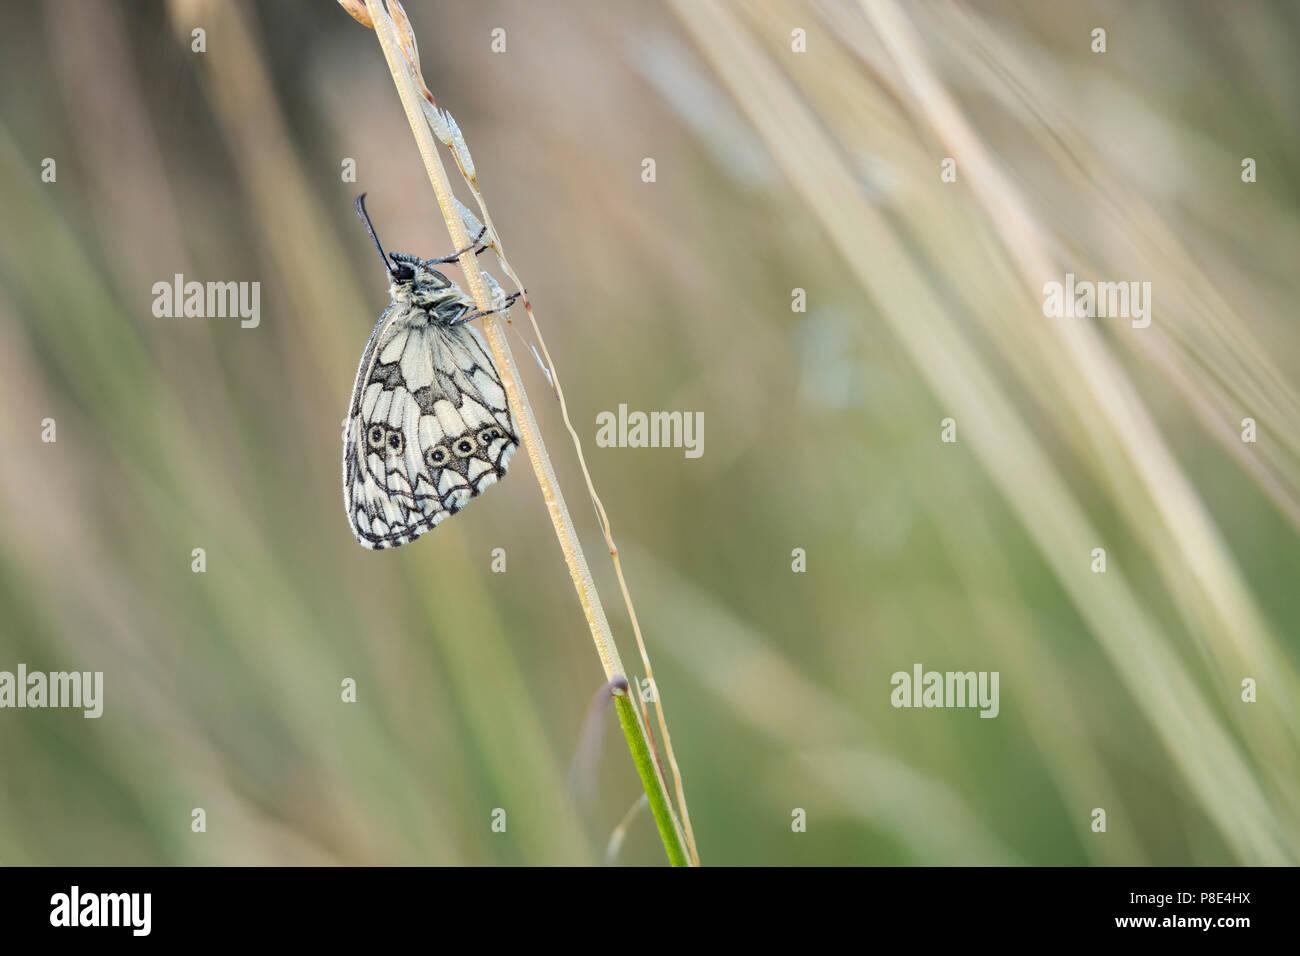 Marbled white (Melanargia galathea) on a blade of grass, Hesse, Germany - Stock Image